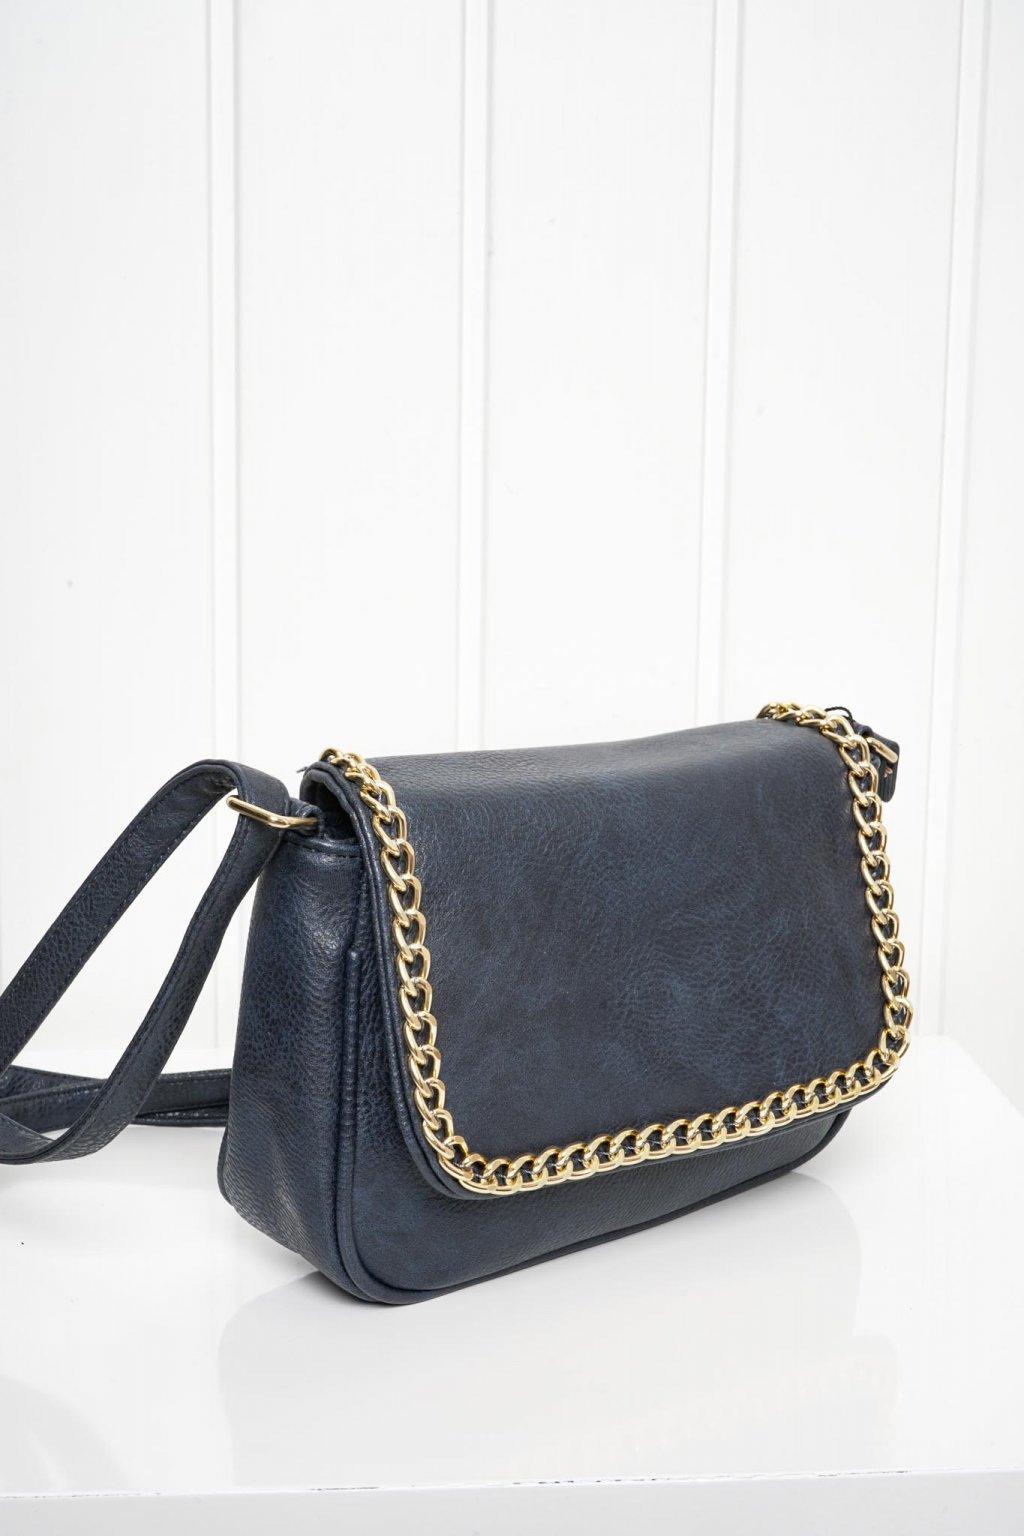 Kabelka, crossbody, ruksak, shopping bag, shopperka, 622